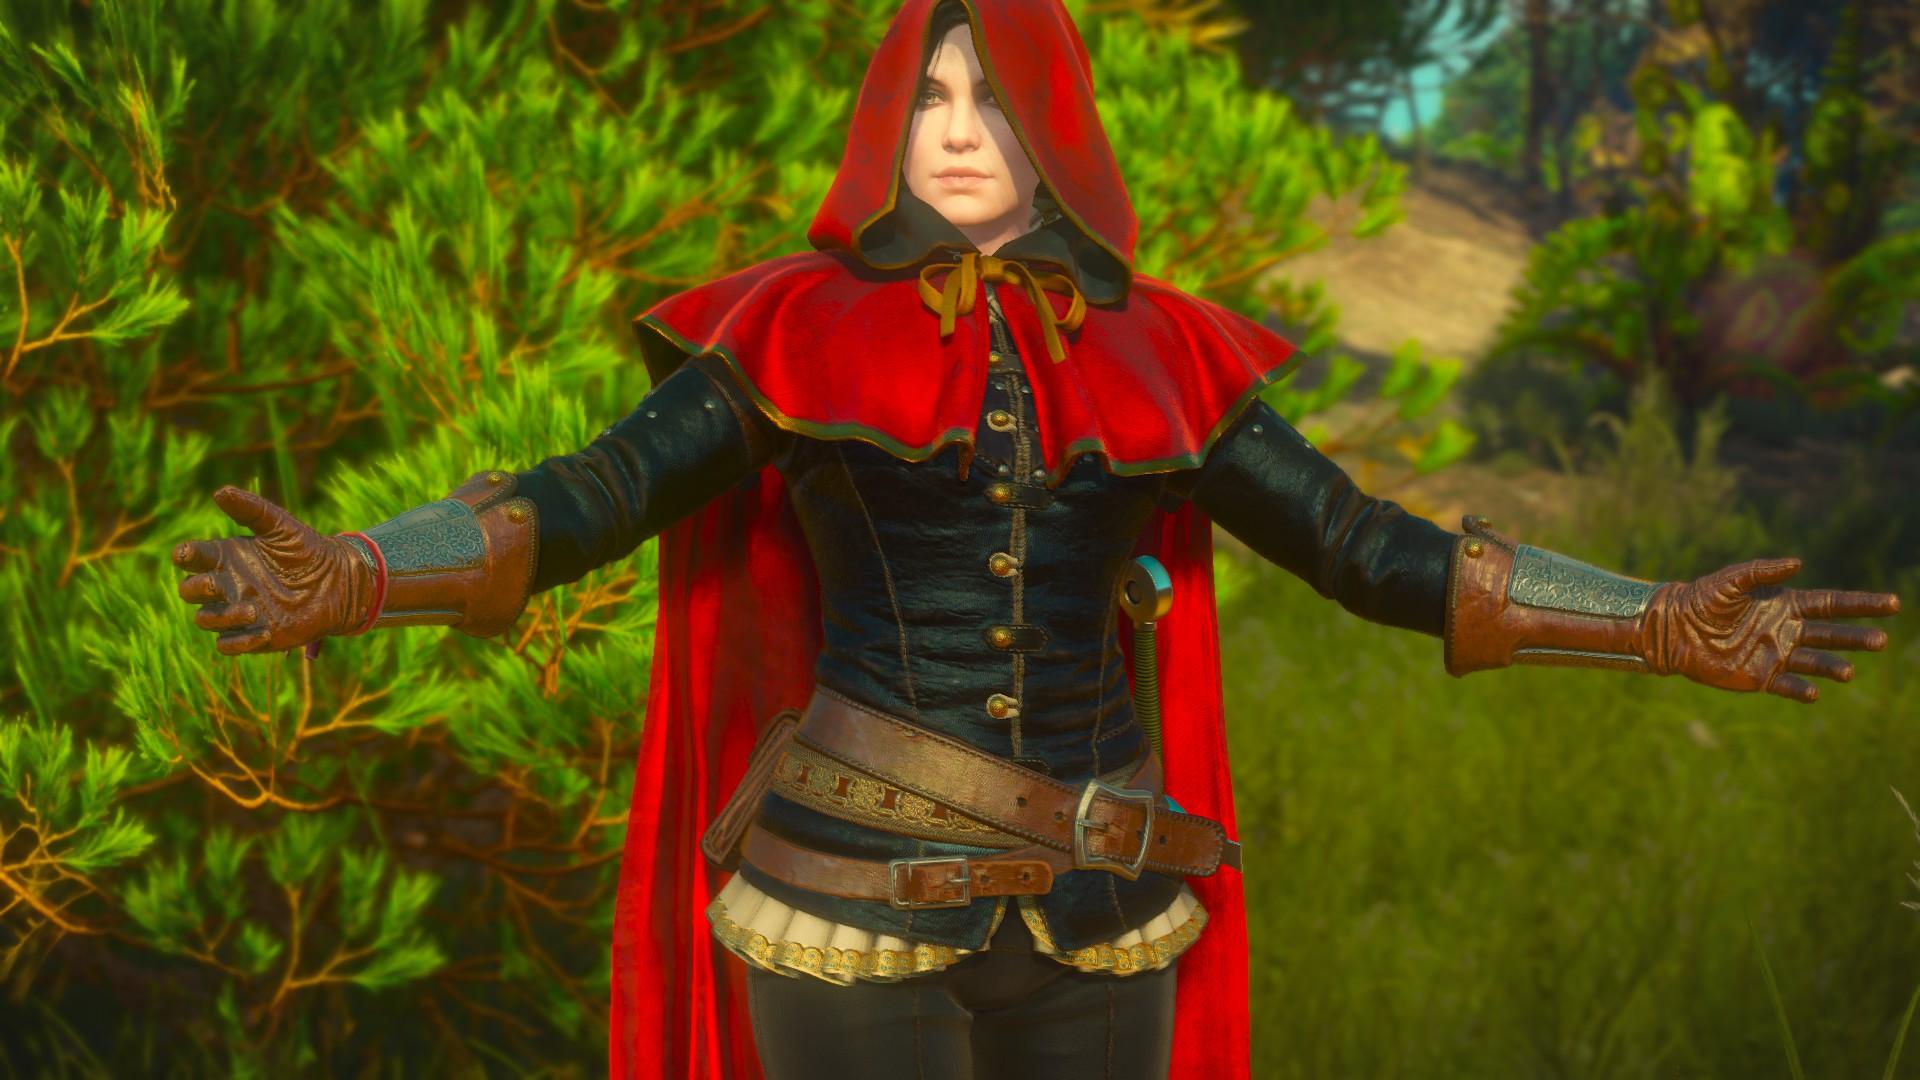 292030_screenshots_20160611130932_1.jpg - The Witcher 3: Wild Hunt